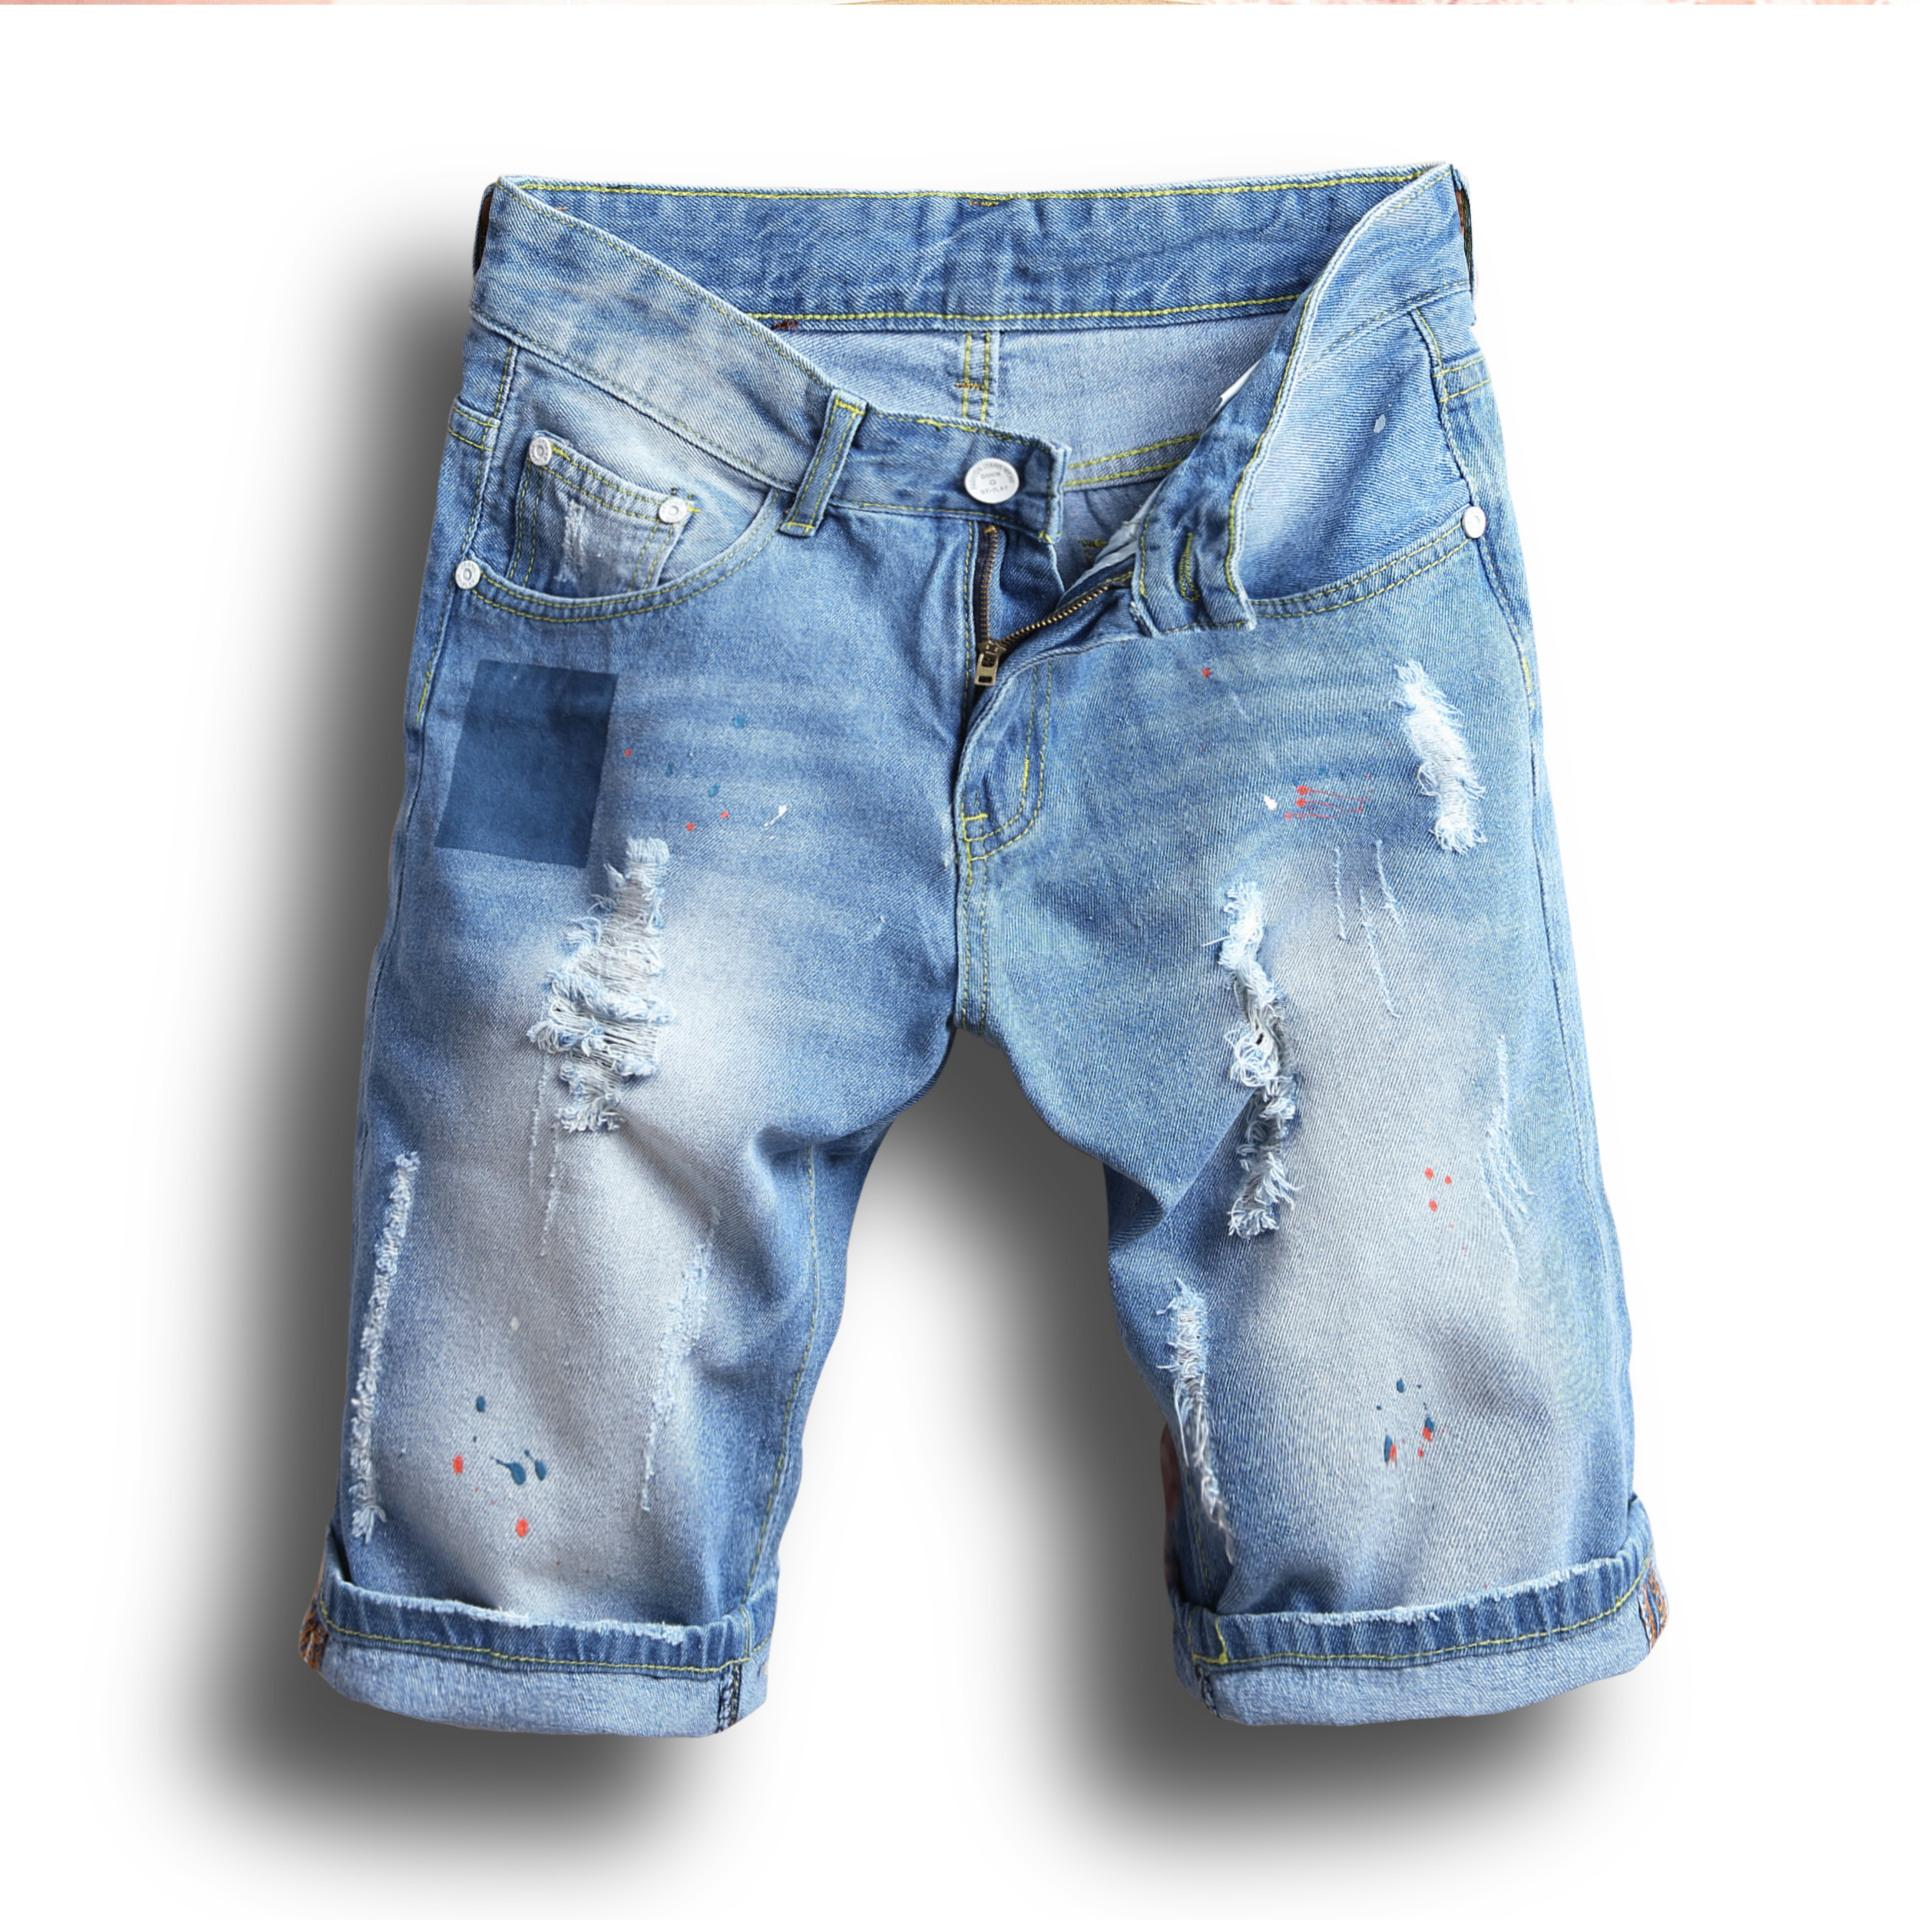 17abb0a84f788b 2019 Summer Fashion Men Jeans Shorts Cotton Denim Ripped Shorts Brand  Designer Casual Short Jeans Men Plus Size From Xunmi, $19.29 | DHgate.Com